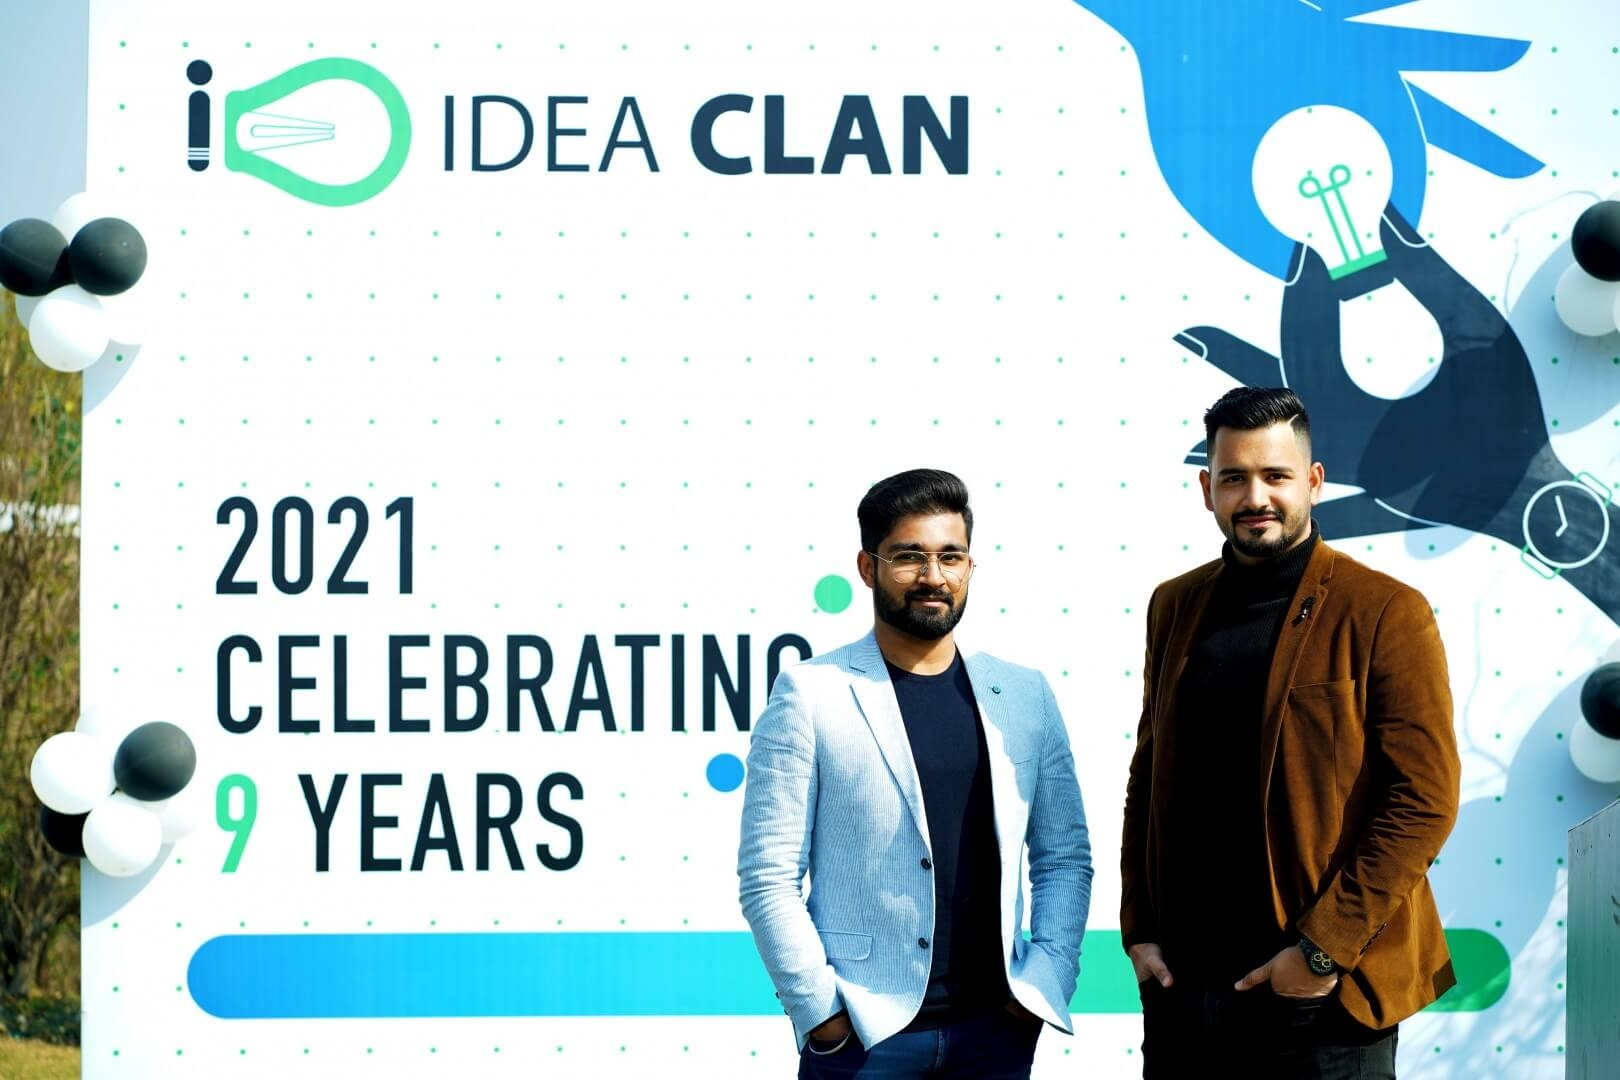 Idea_Clan.jpg